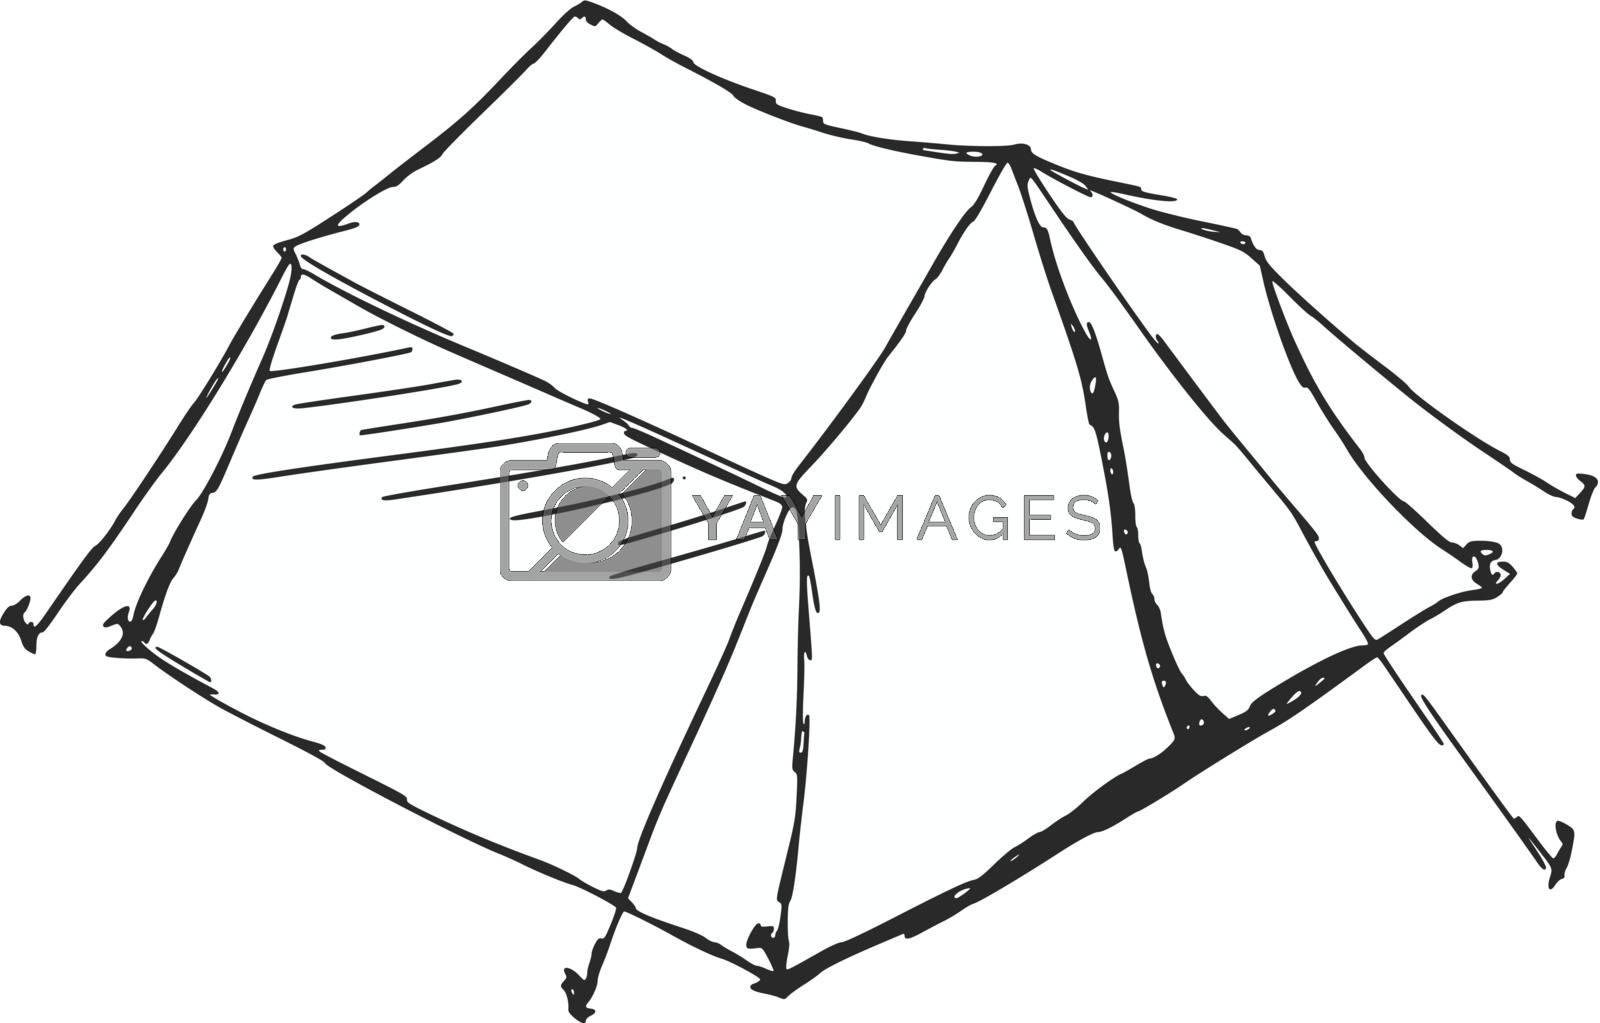 hand drawn, sketch, cartoon illustration of tent